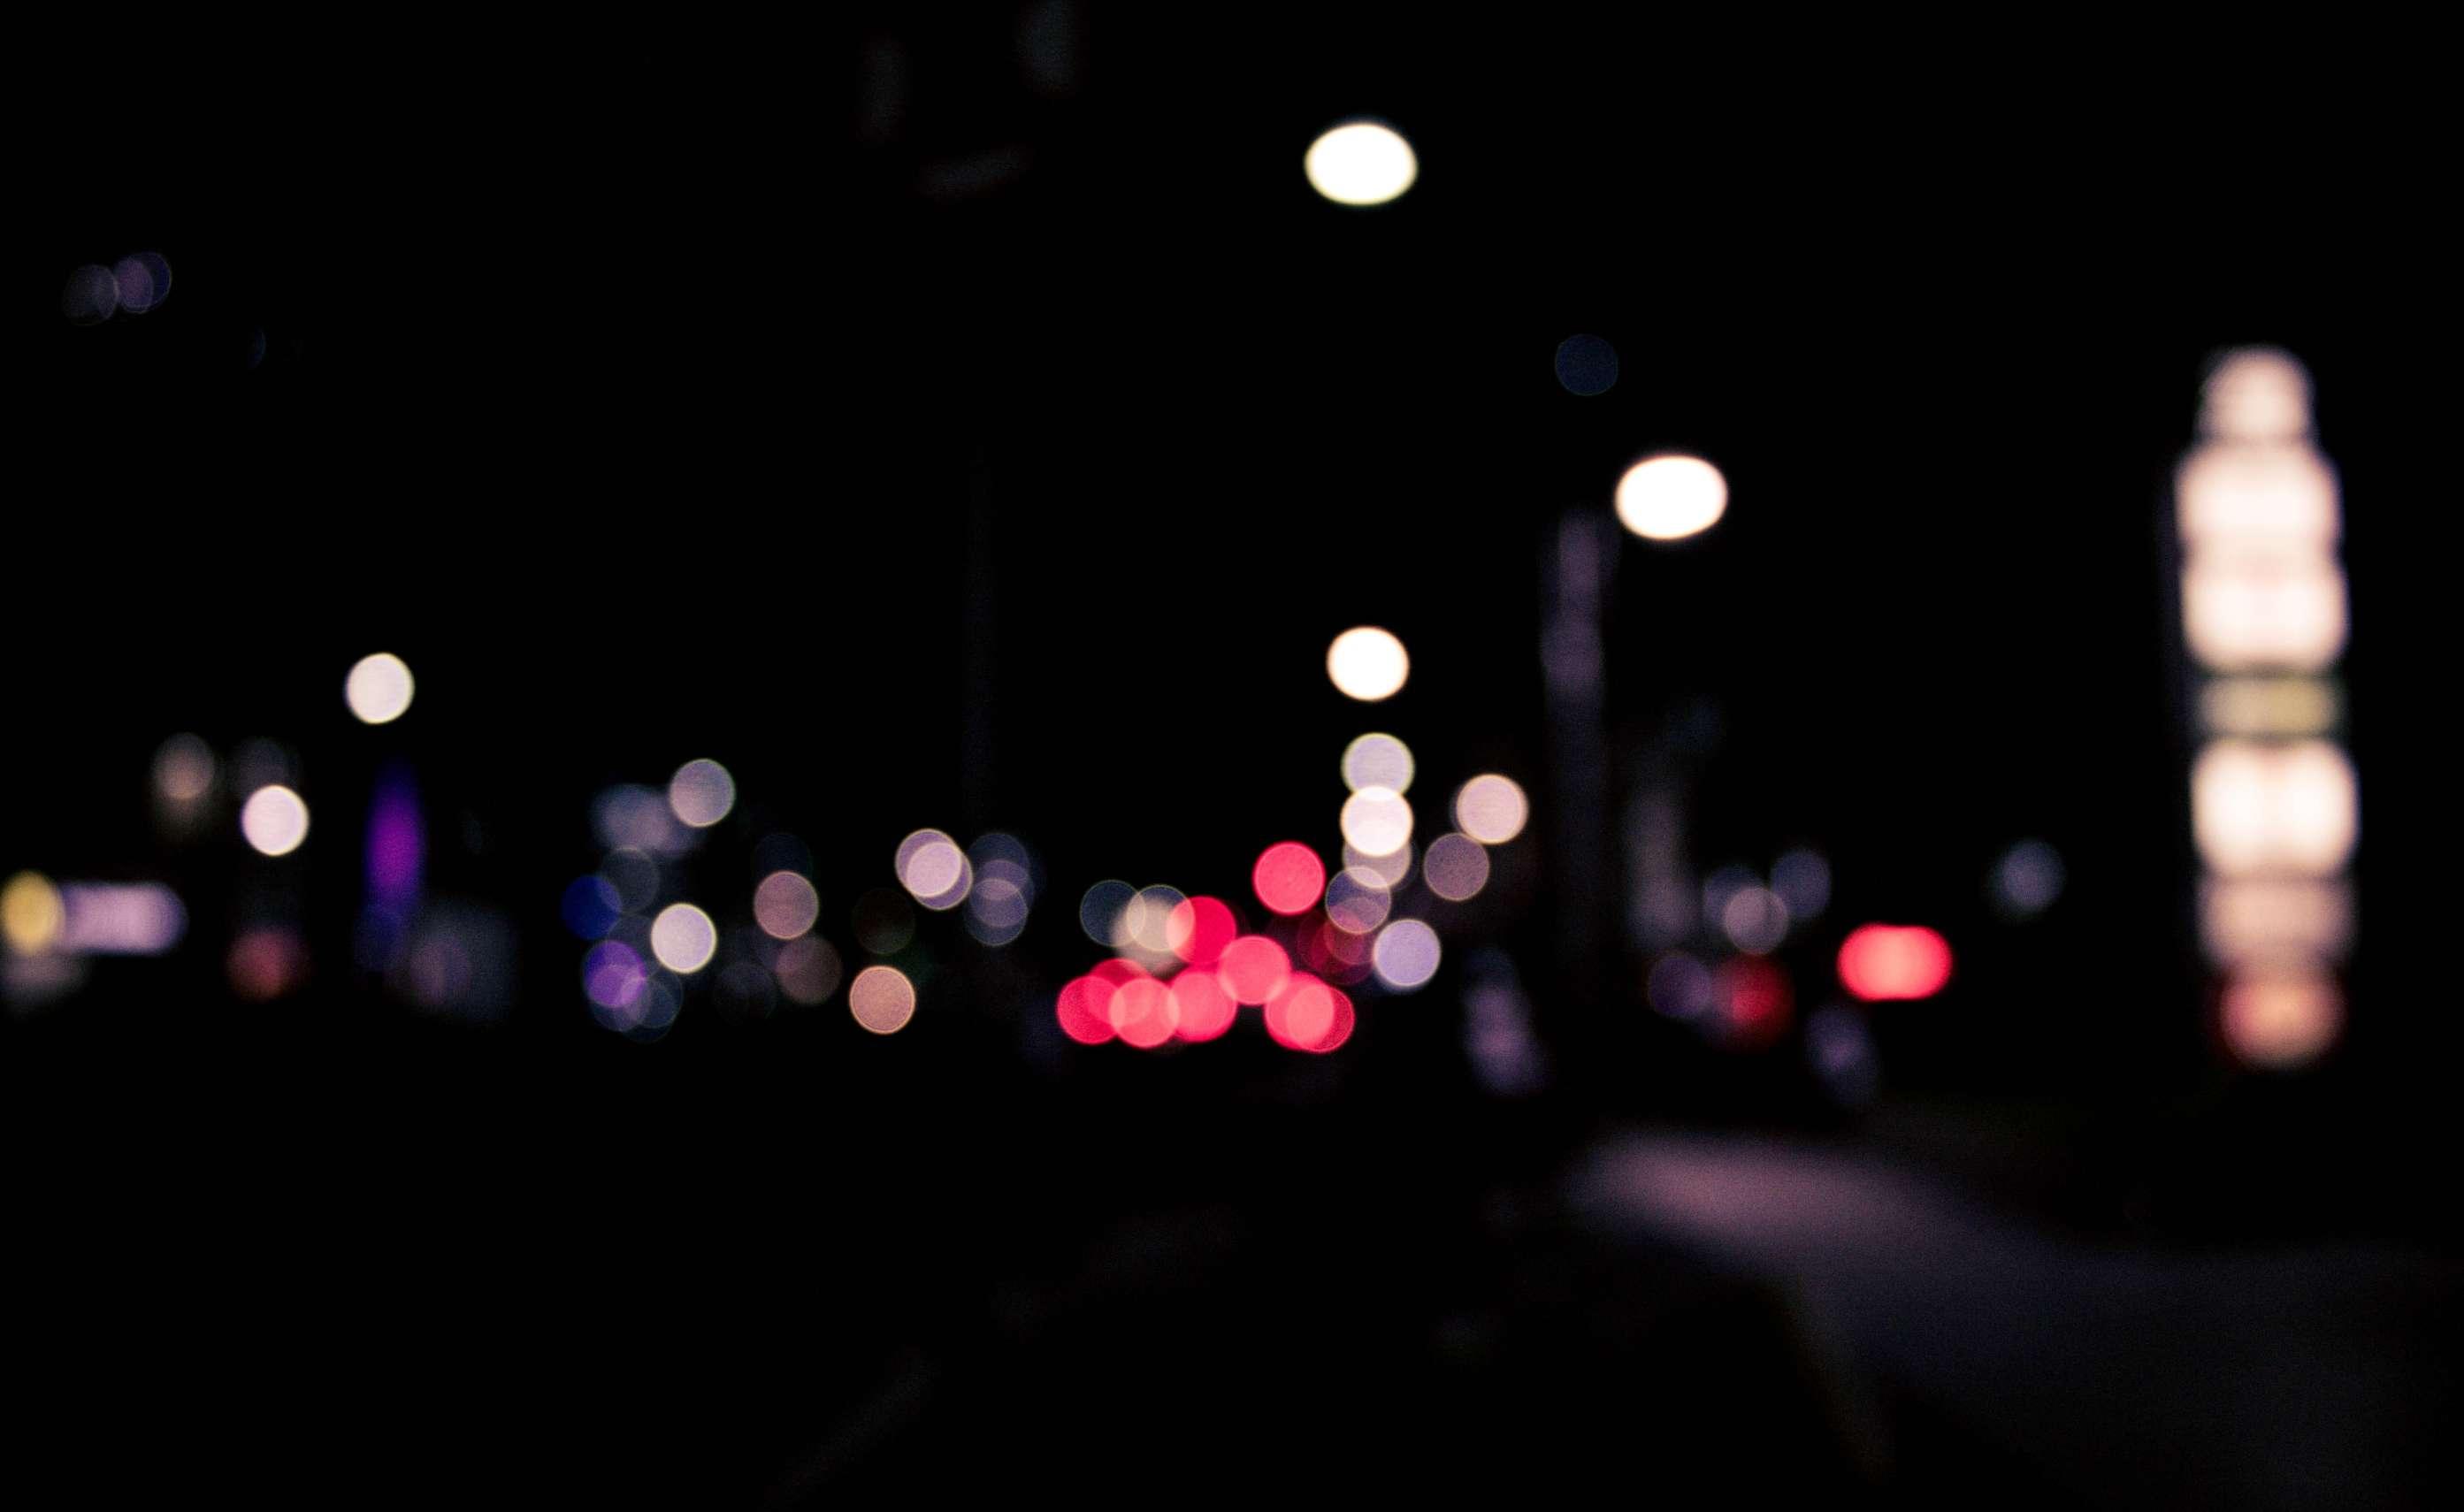 blur-bokeh-dark-376533Reckless Driving in Wisconsin